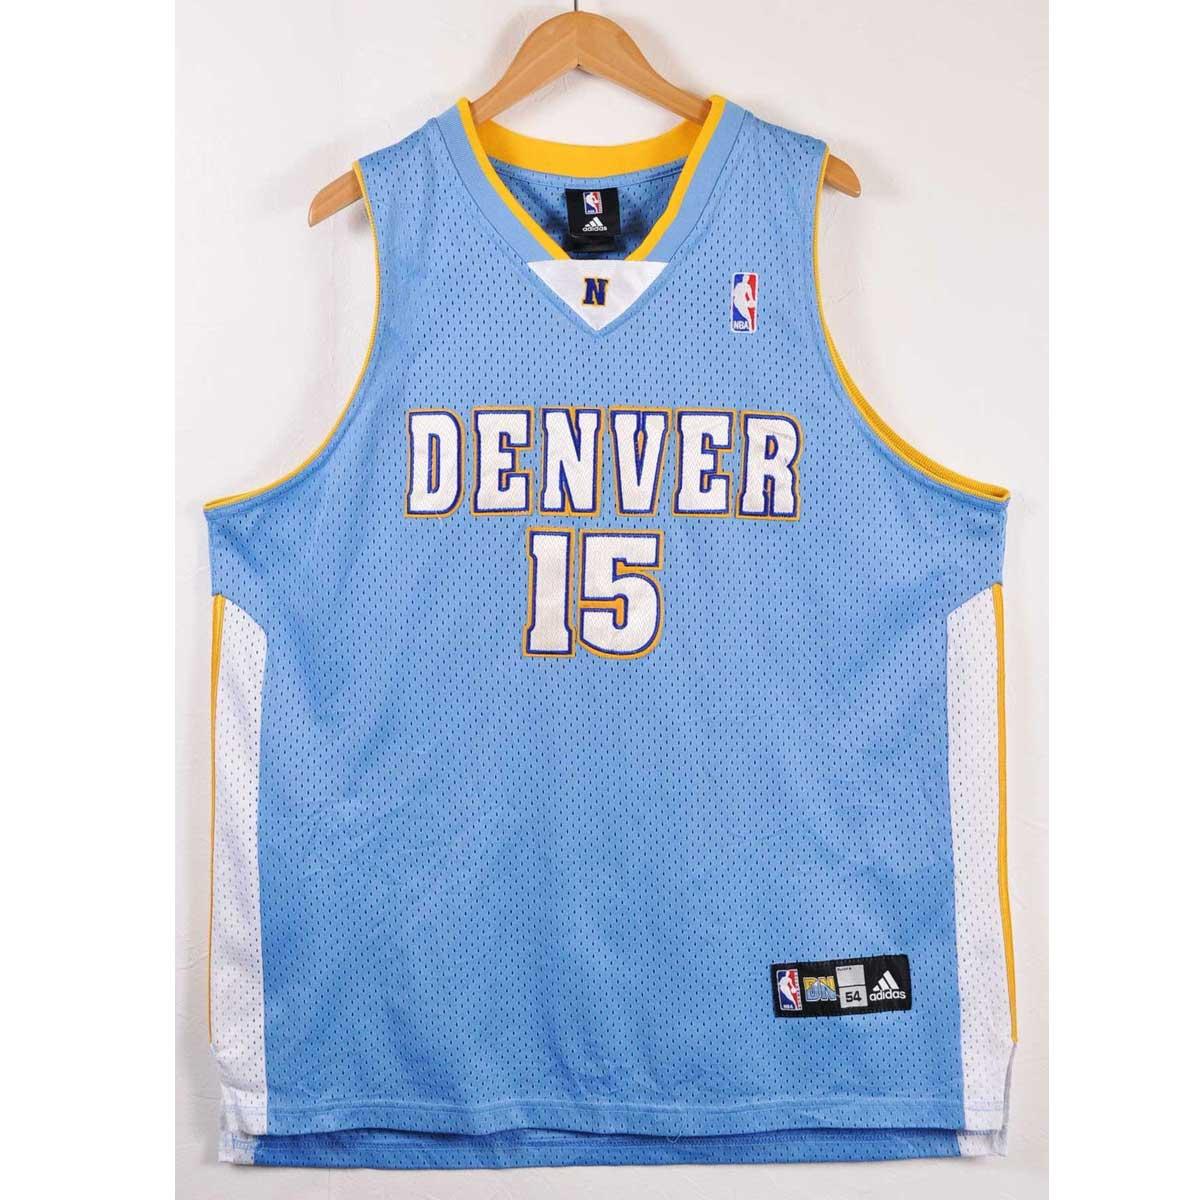 100% authentic 532b6 7cf5c adidas Adidas NBA Denver Nuggets Denver Nuggets car Melo Anthony basketball  tank top uniform numbering sax blue men XL equivalency▼